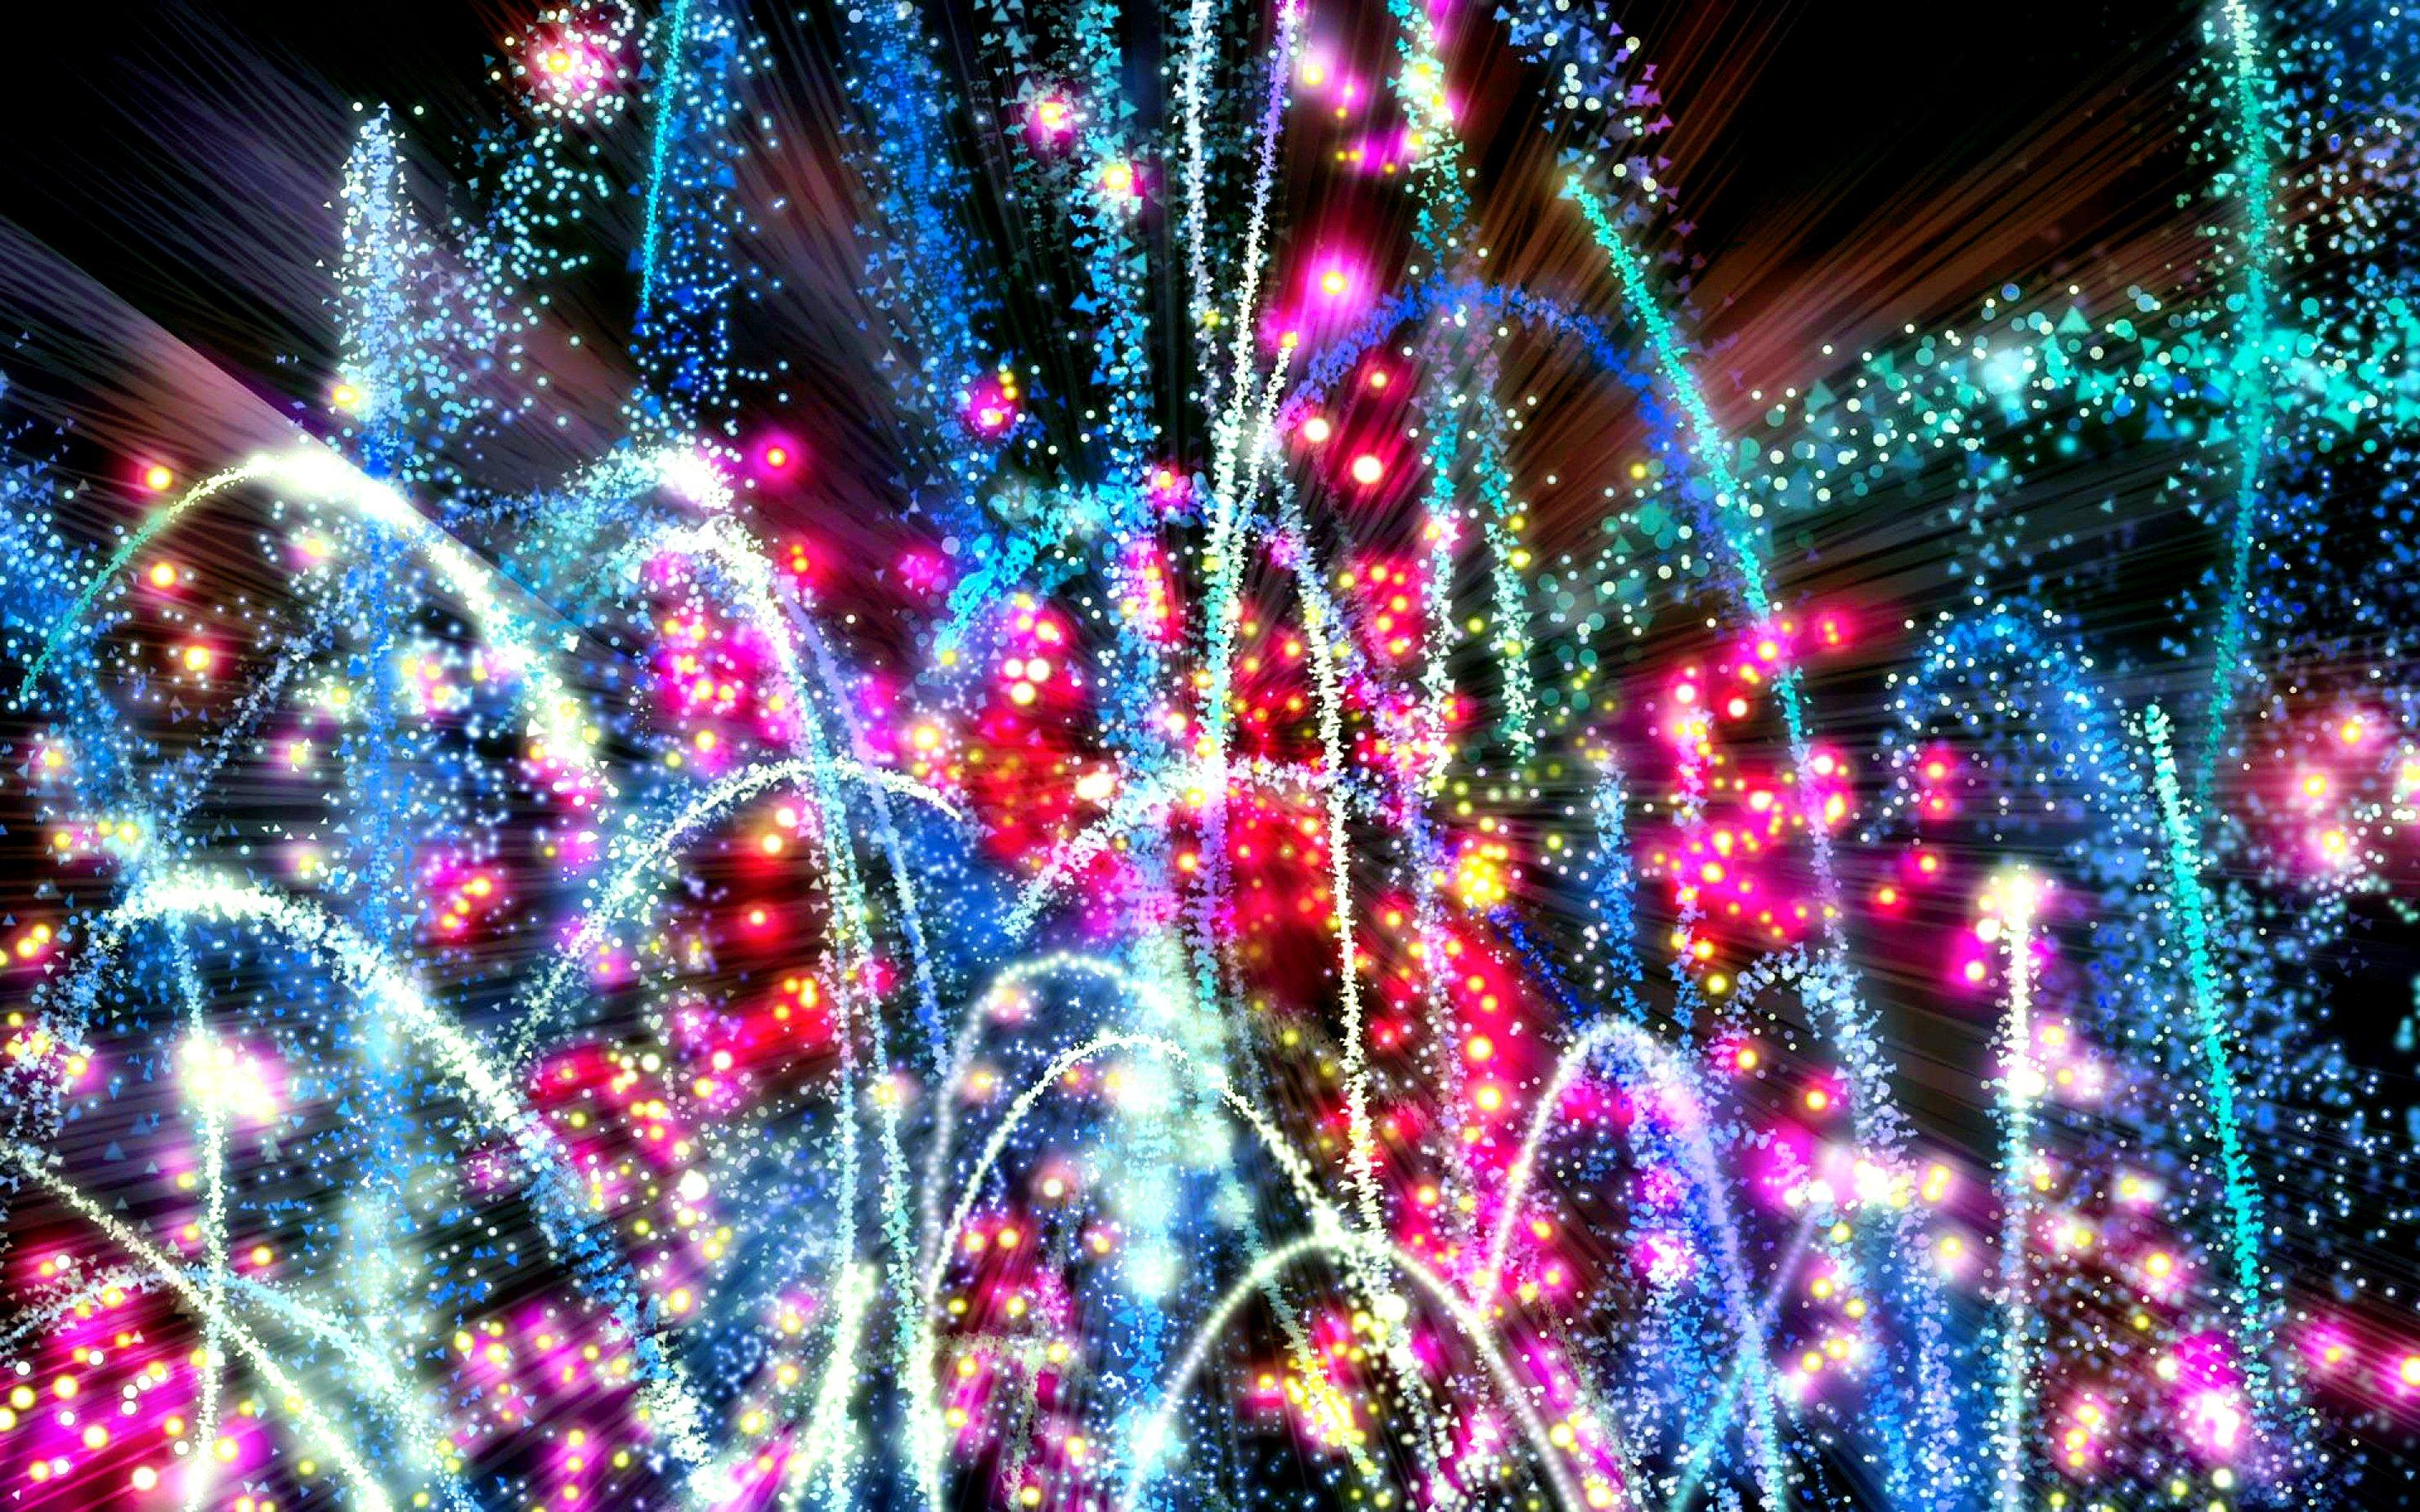 Best 3d Moving Wallpapers For Desktop Firework Wallpapers Hd Pixelstalk Net